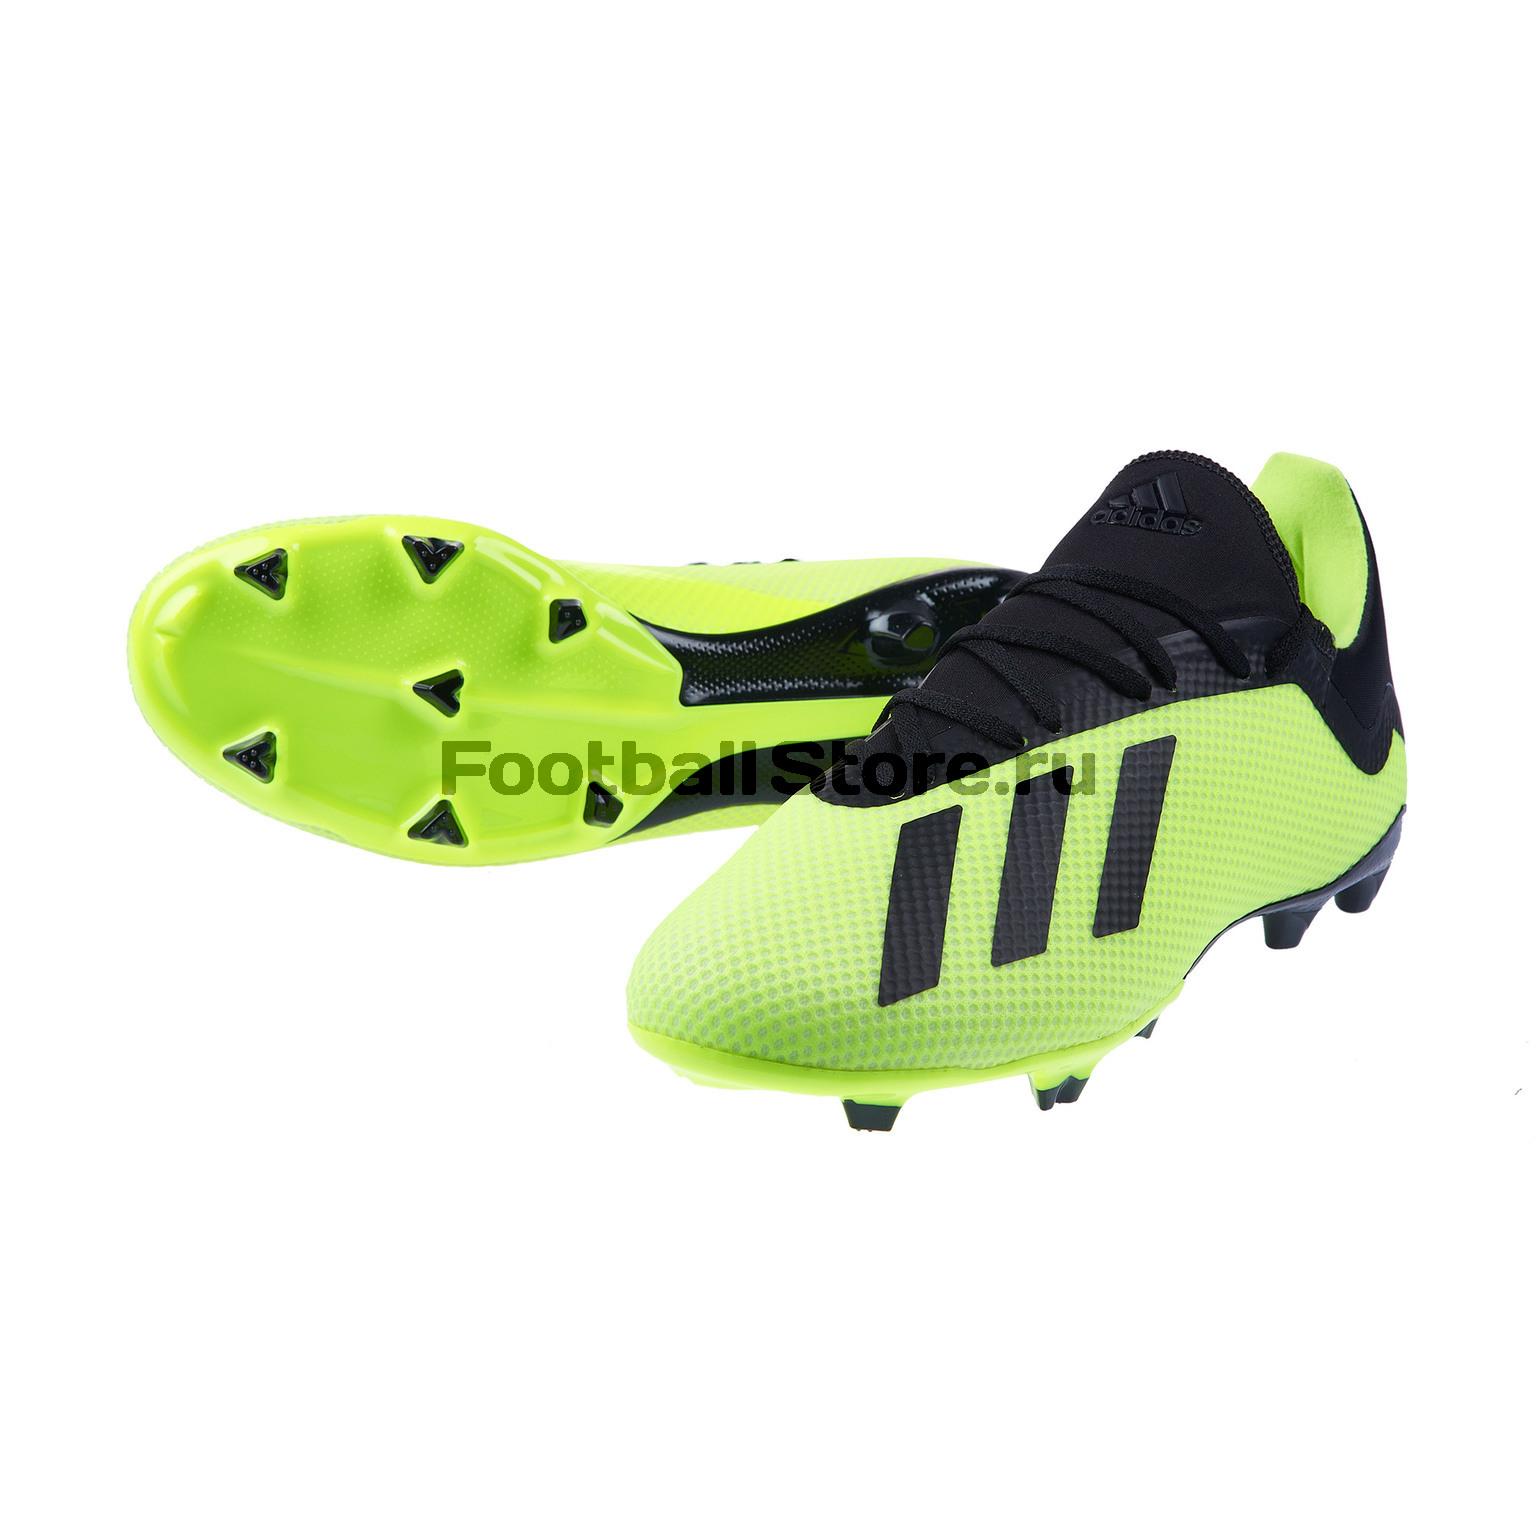 Бутсы Adidas X 18.3 FG DB2183 бутсы nike mercurial victory iii fg 509128 800